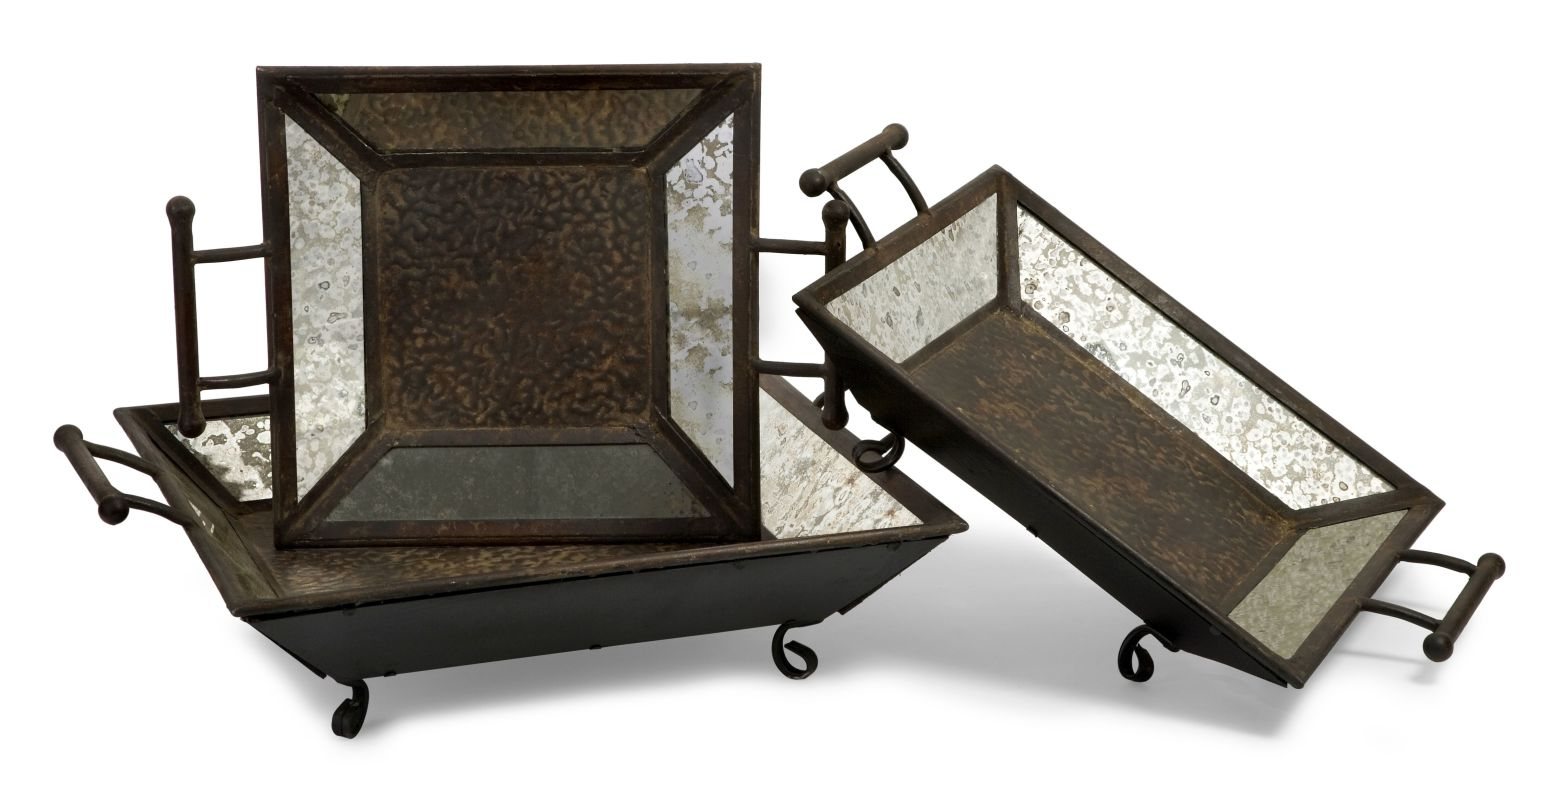 IMAX Home 1324-3 Mirror Trays - Set of 3 Home Decor Decorative